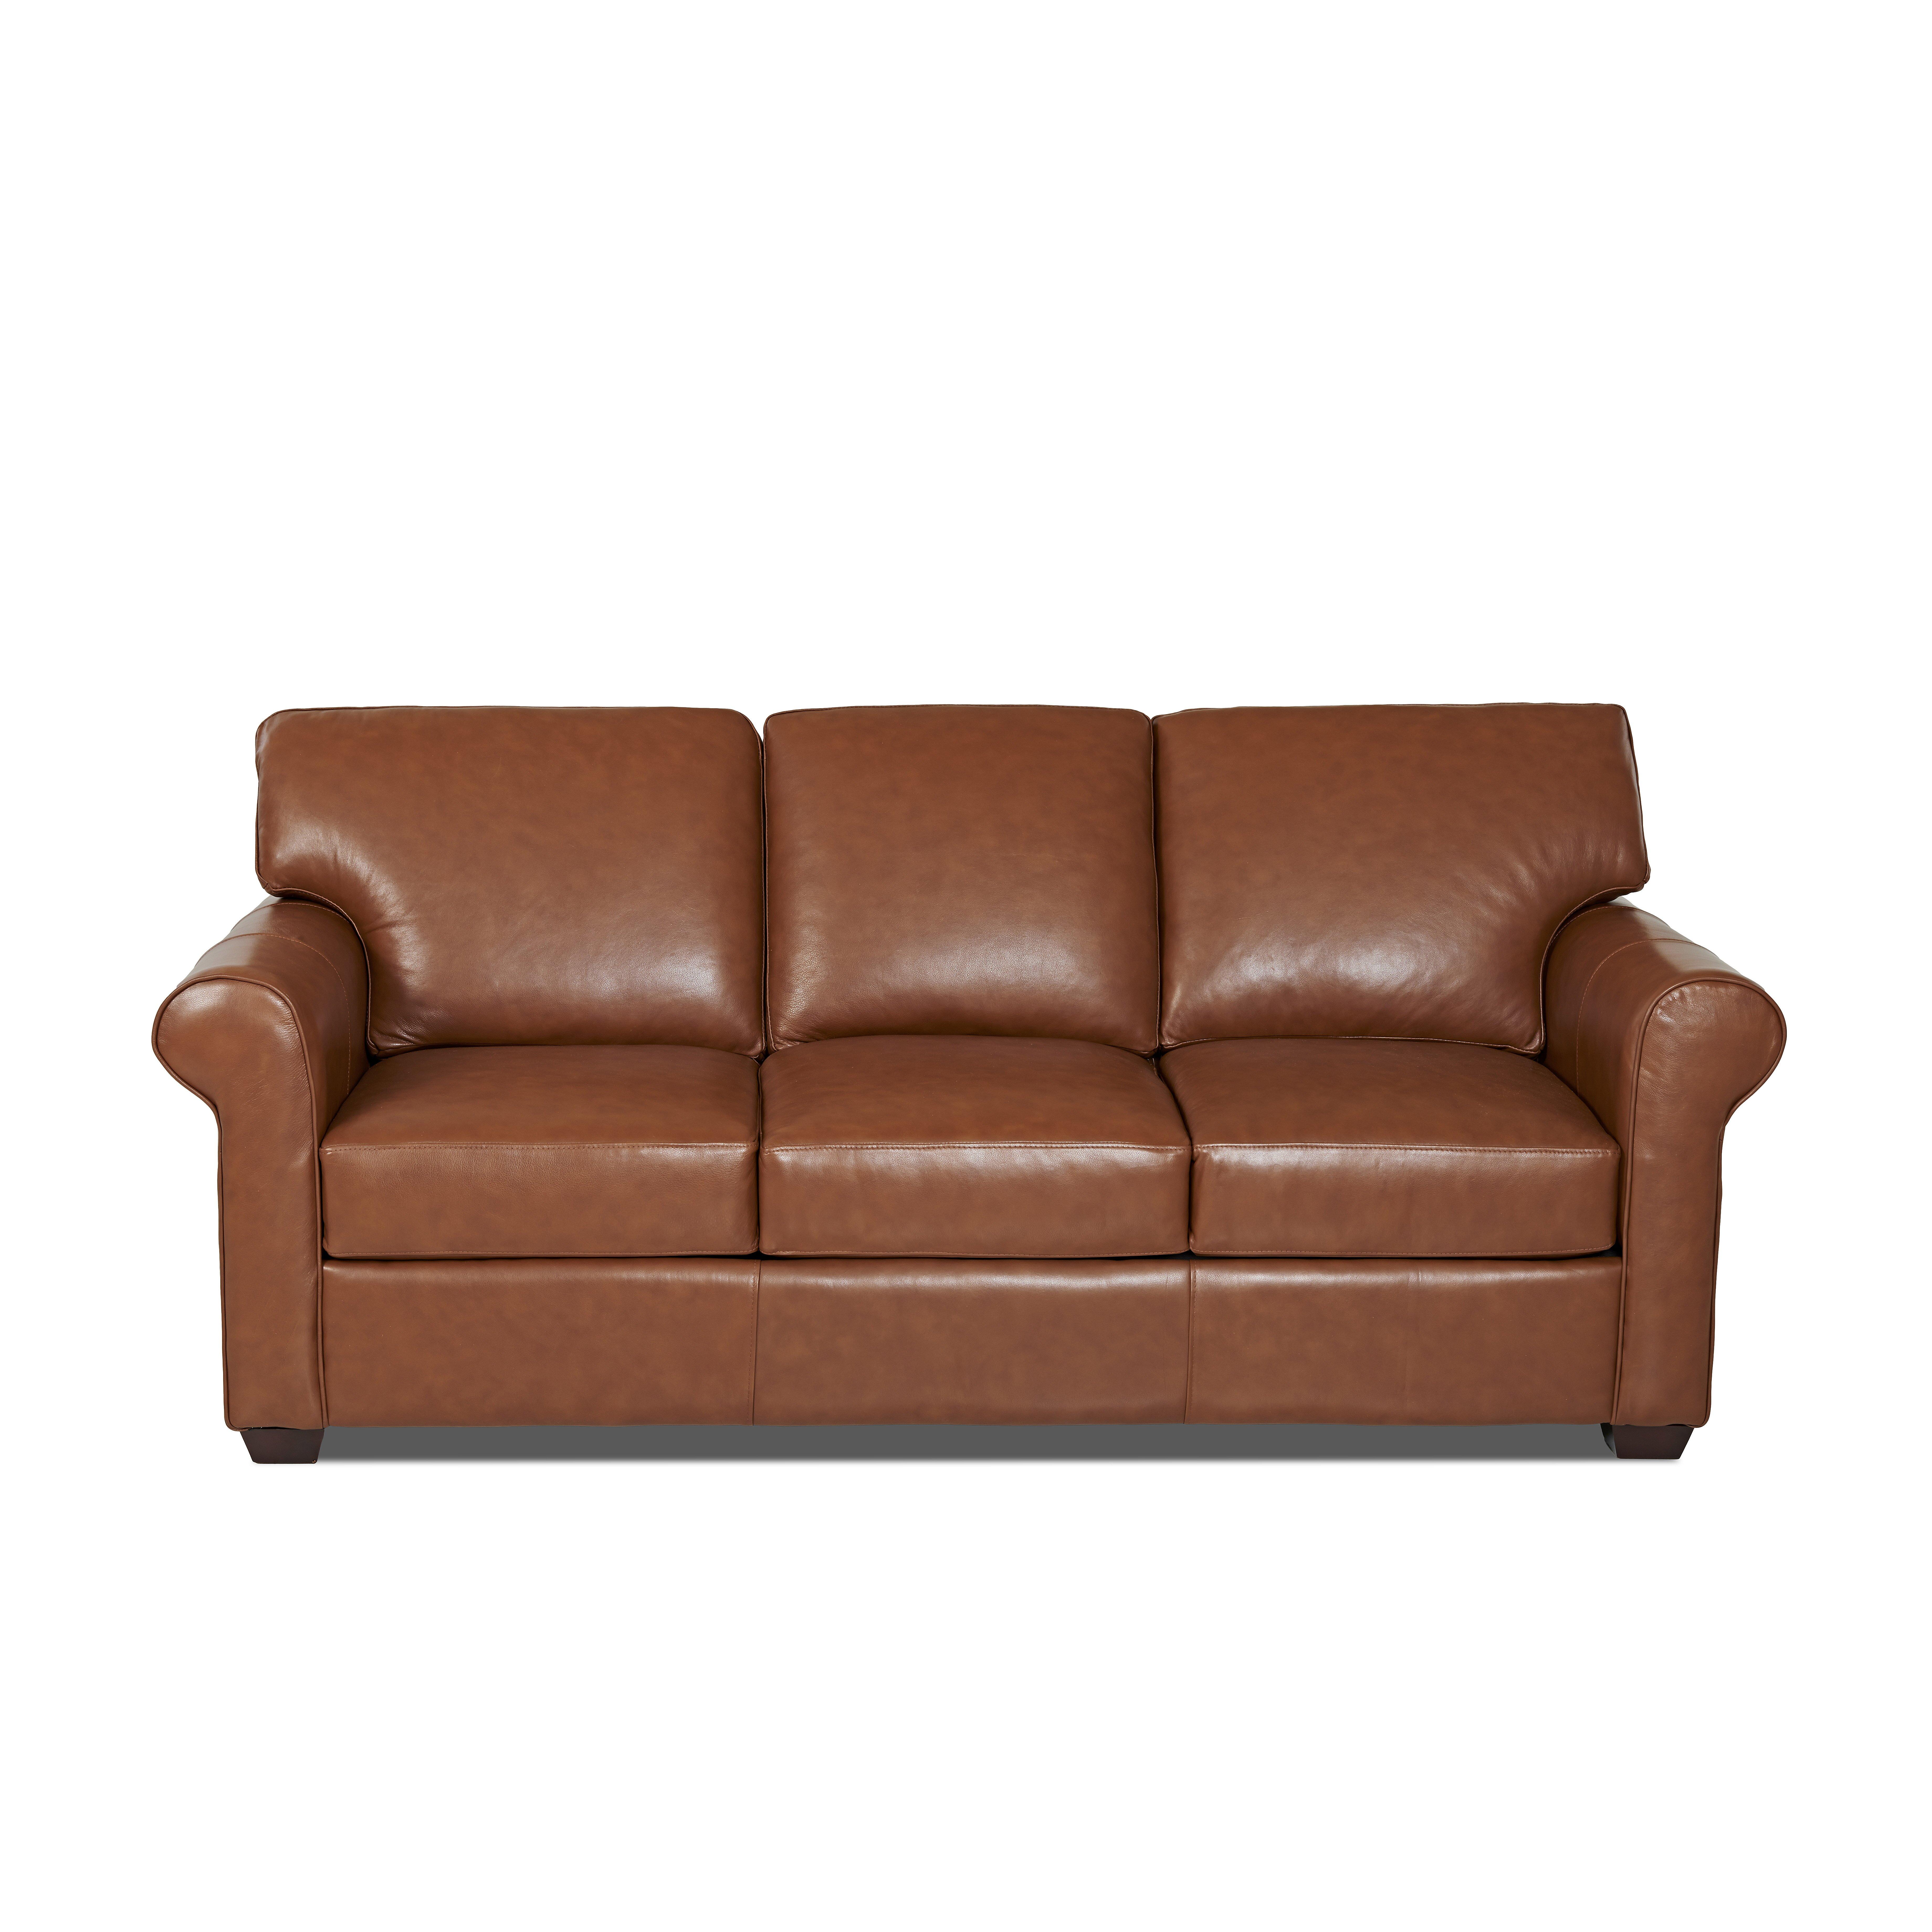 Wayfair Sofa Sleeper Wayfair Custom Upholstery Leather